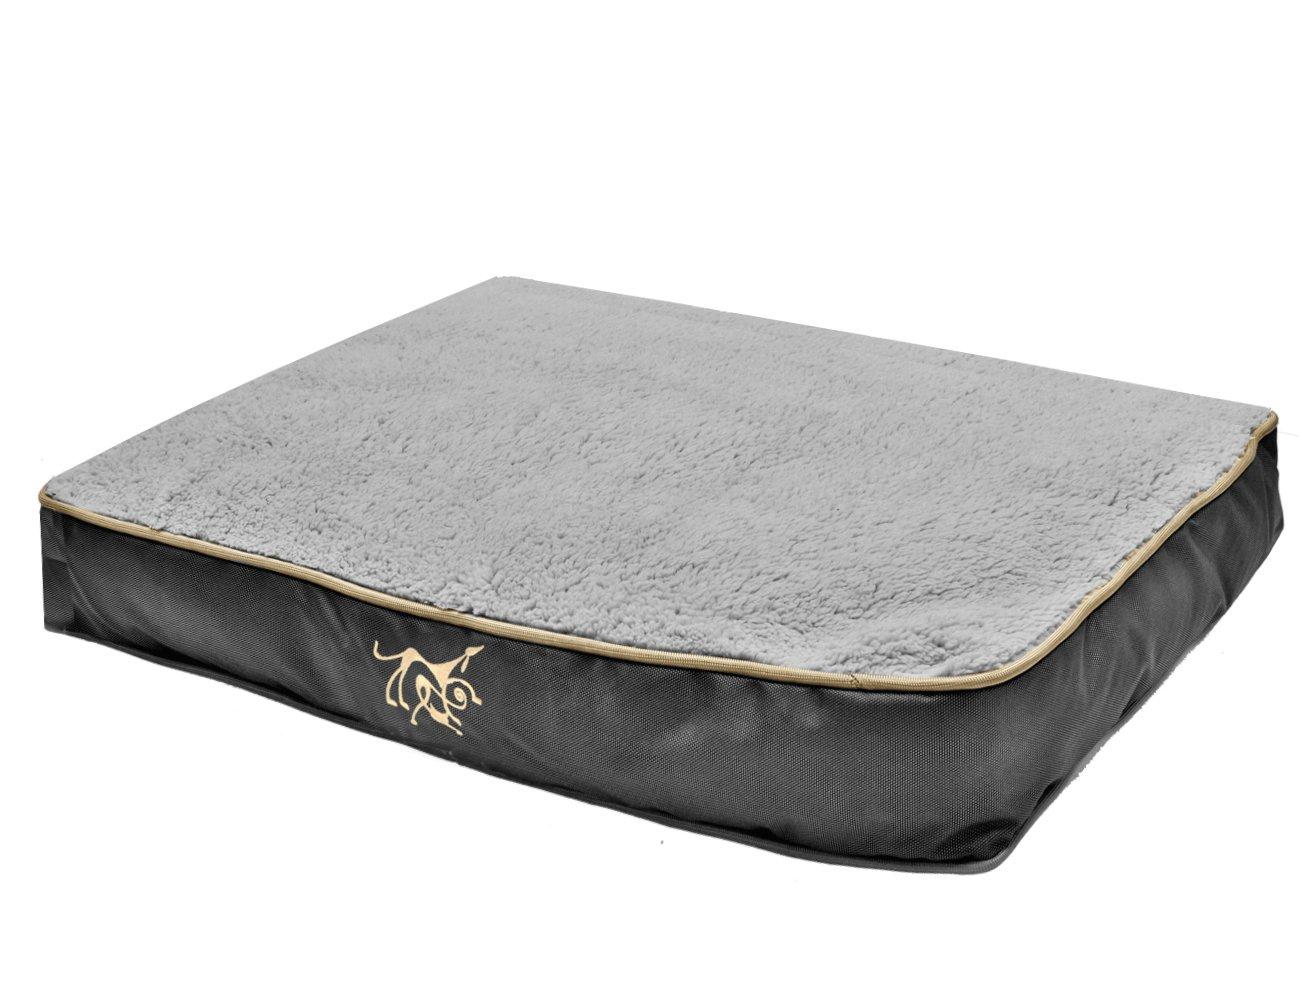 VADIGRAN Materasso Materasso Materasso sfoderabile nero Oxford 110 x 70 x 10 cm 6dbba5